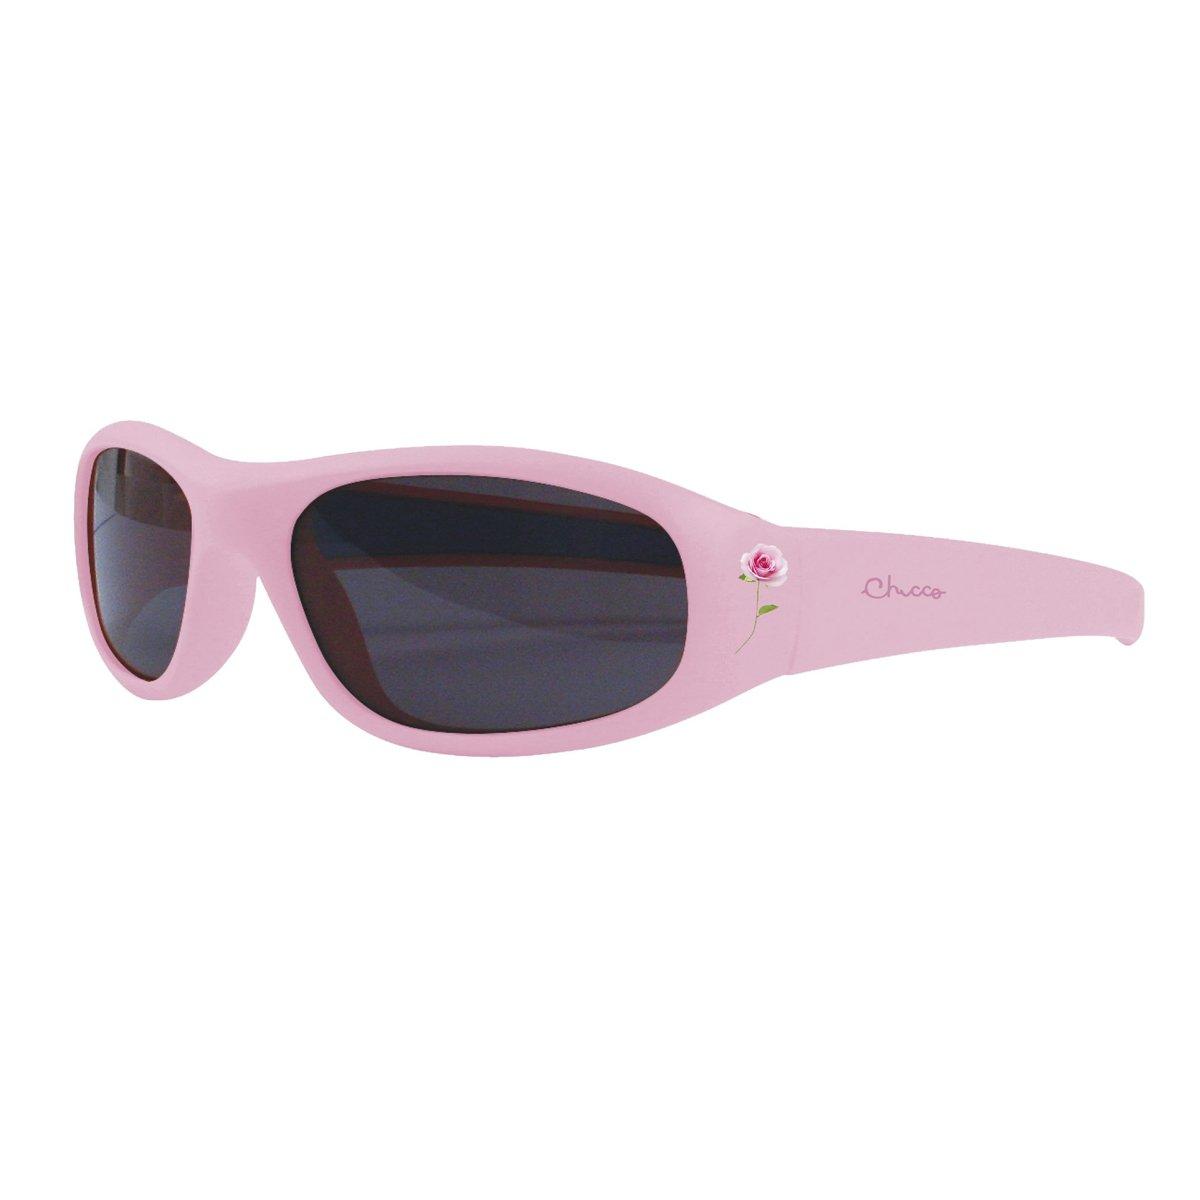 Chicco Romance - Gafas de sol 0 m+, color rosa Girl Romance